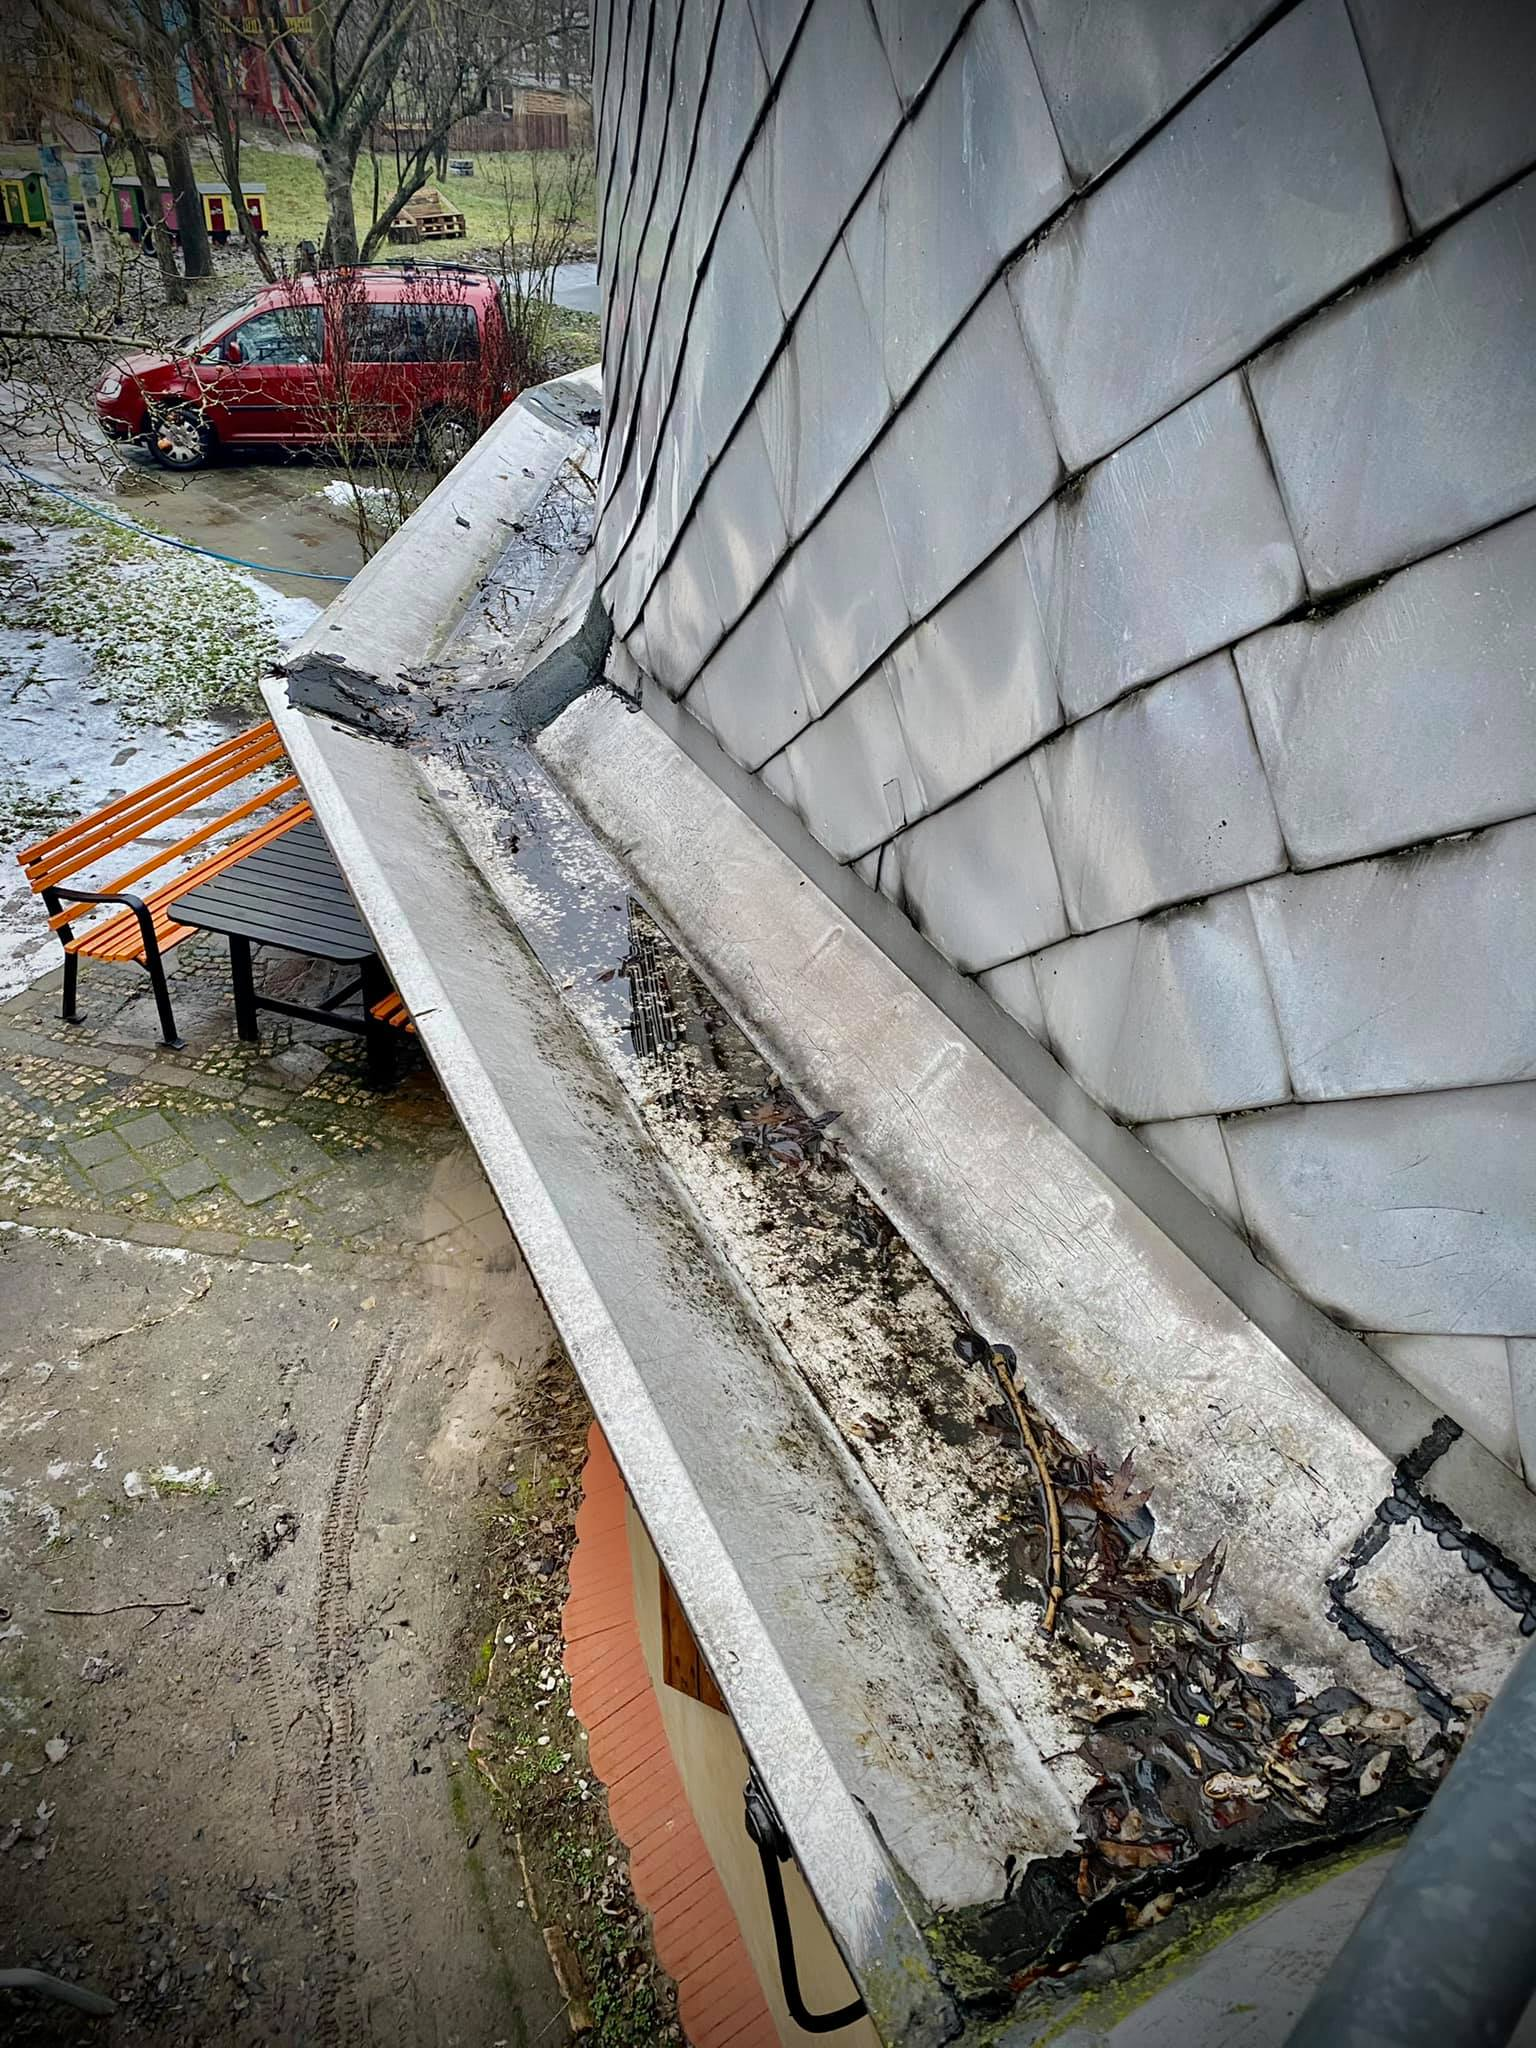 So sah die Dachrinne Anfang Februar aus ... © Spielplatzinitiatve Marzahn